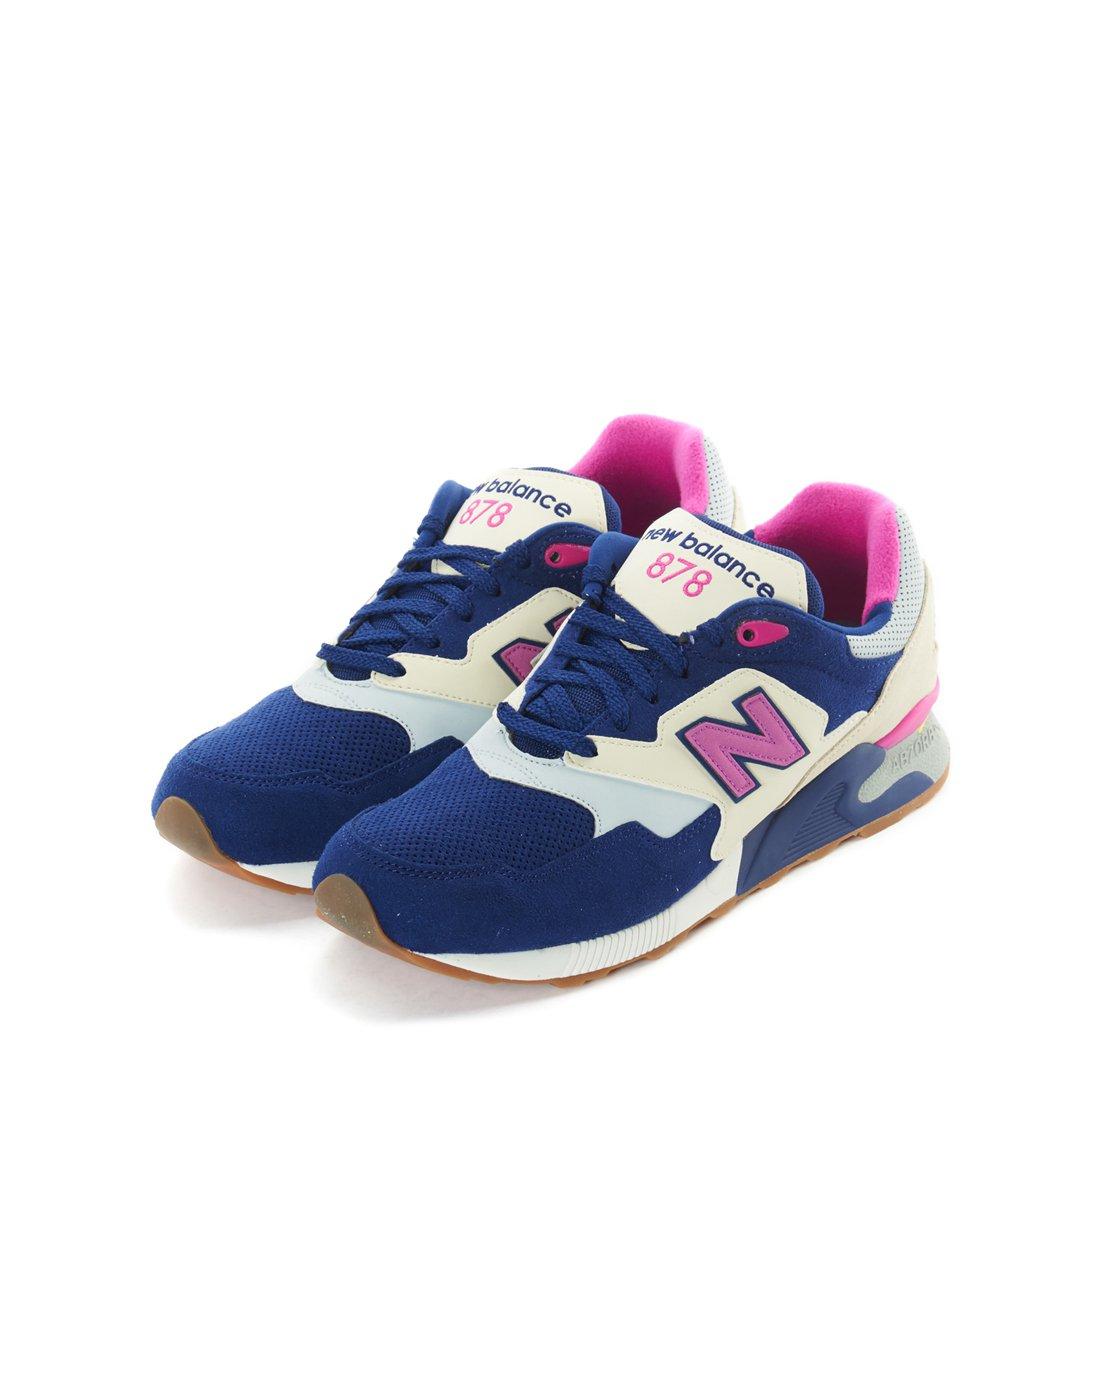 d2d265d41688 New BalanceNew Balance 878系列中性款藏青色 浅蓝色运动鞋ML878MBP 唯品会